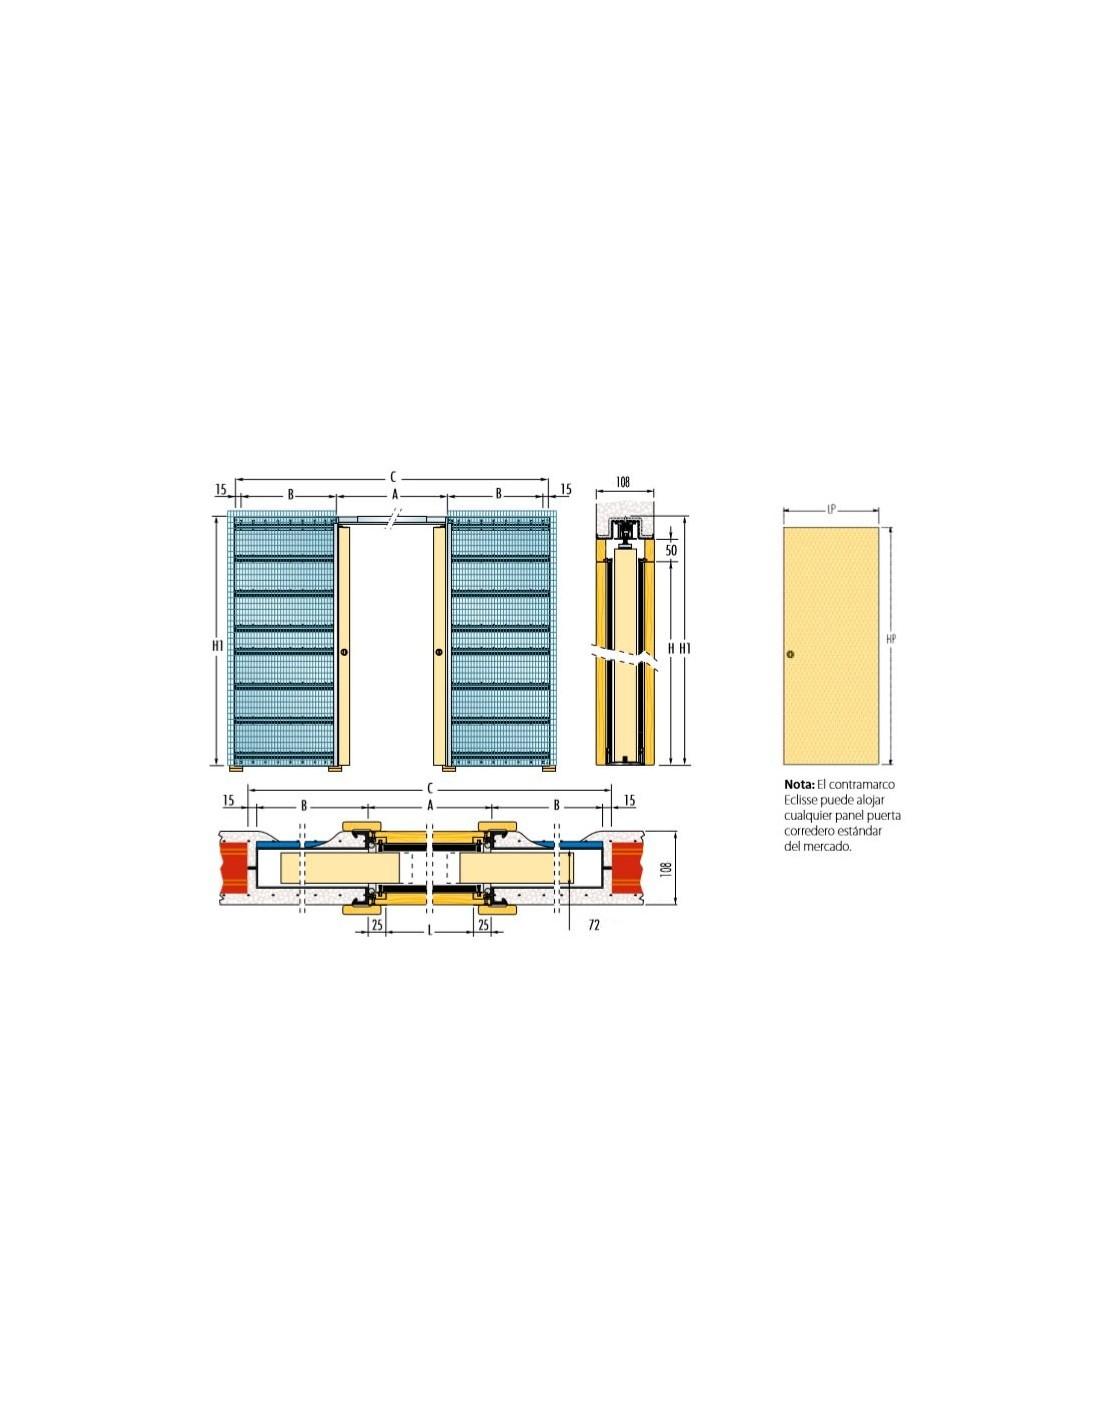 Medidas estandar puertas interiores finest medidas - Medidas de puertas de interior ...